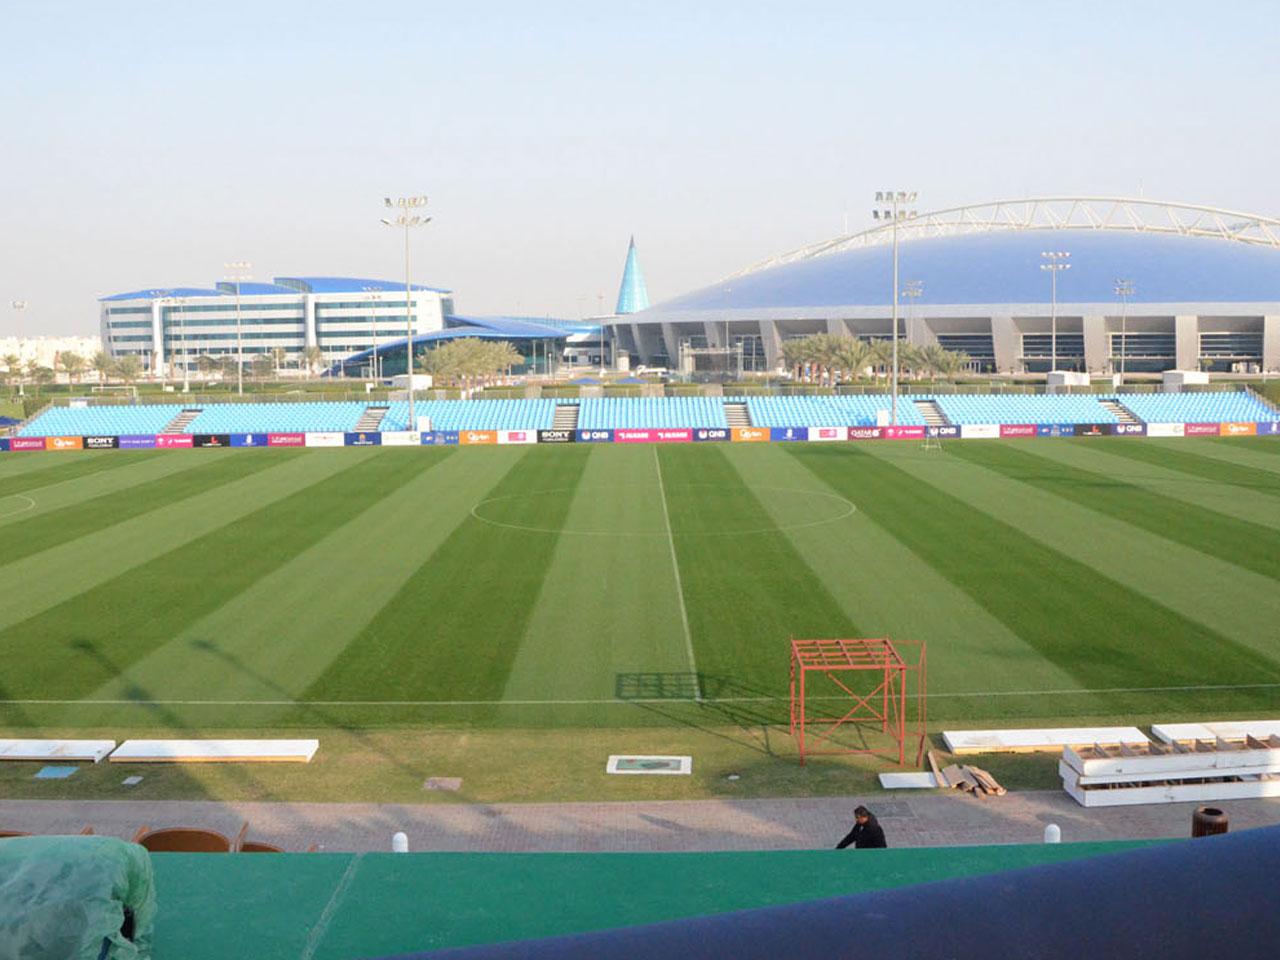 grandstand-seats-events-setup-rental-stadium-seating-sport-management-film-festival-seating-screening-f1-open-air-cinema-24